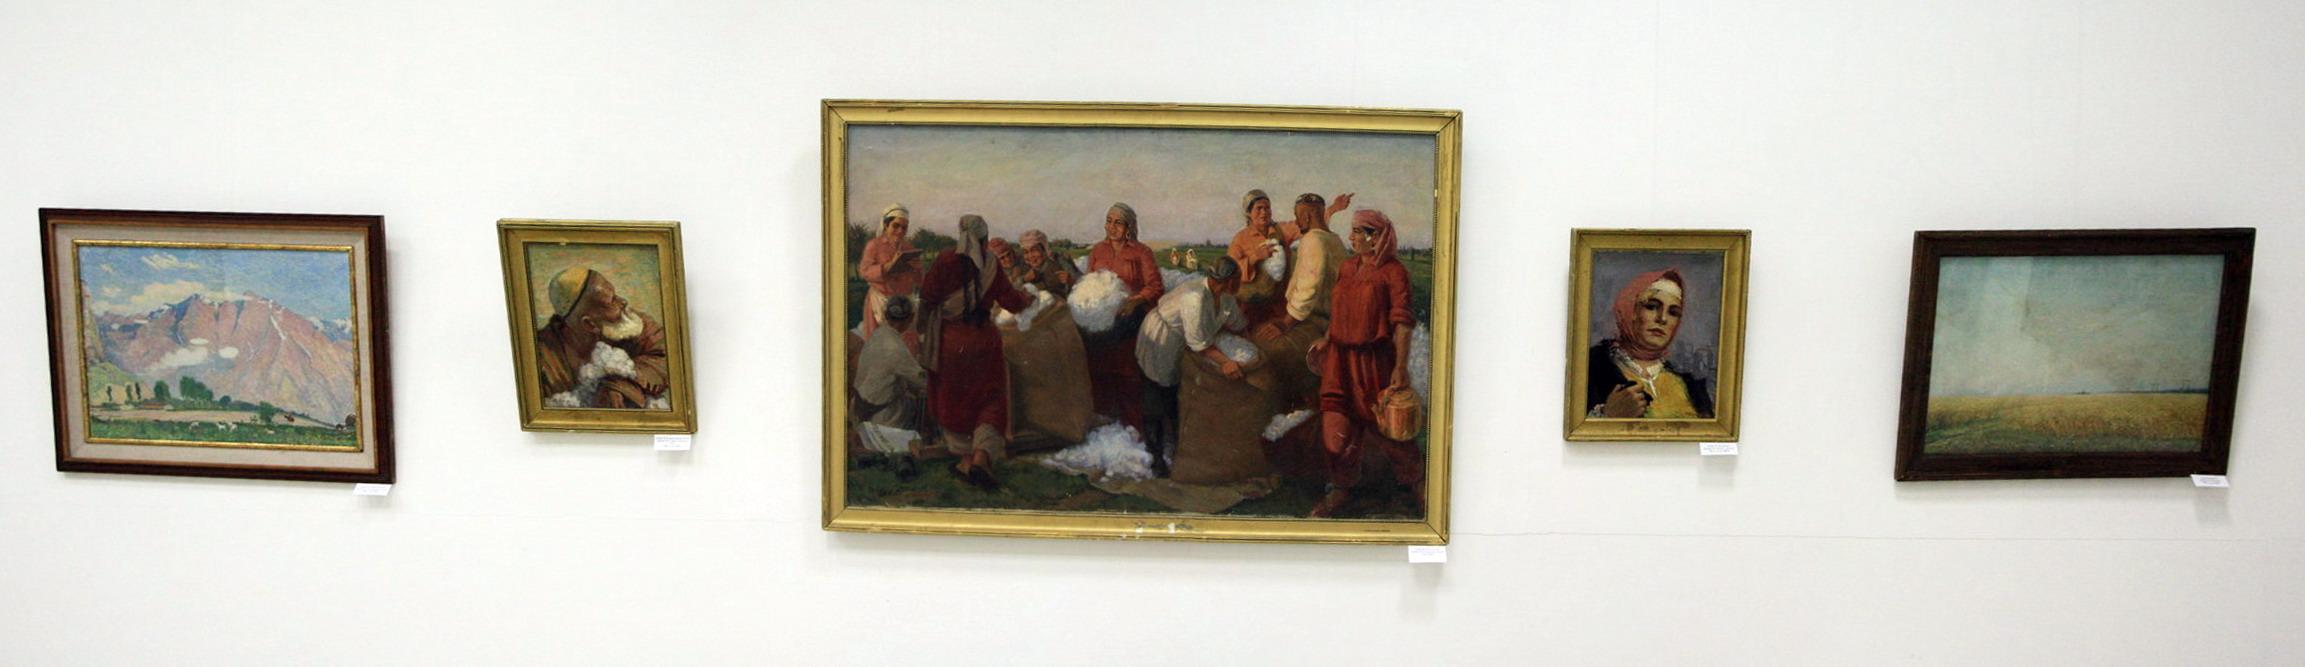 Экспозиция картин Аринина Михаила